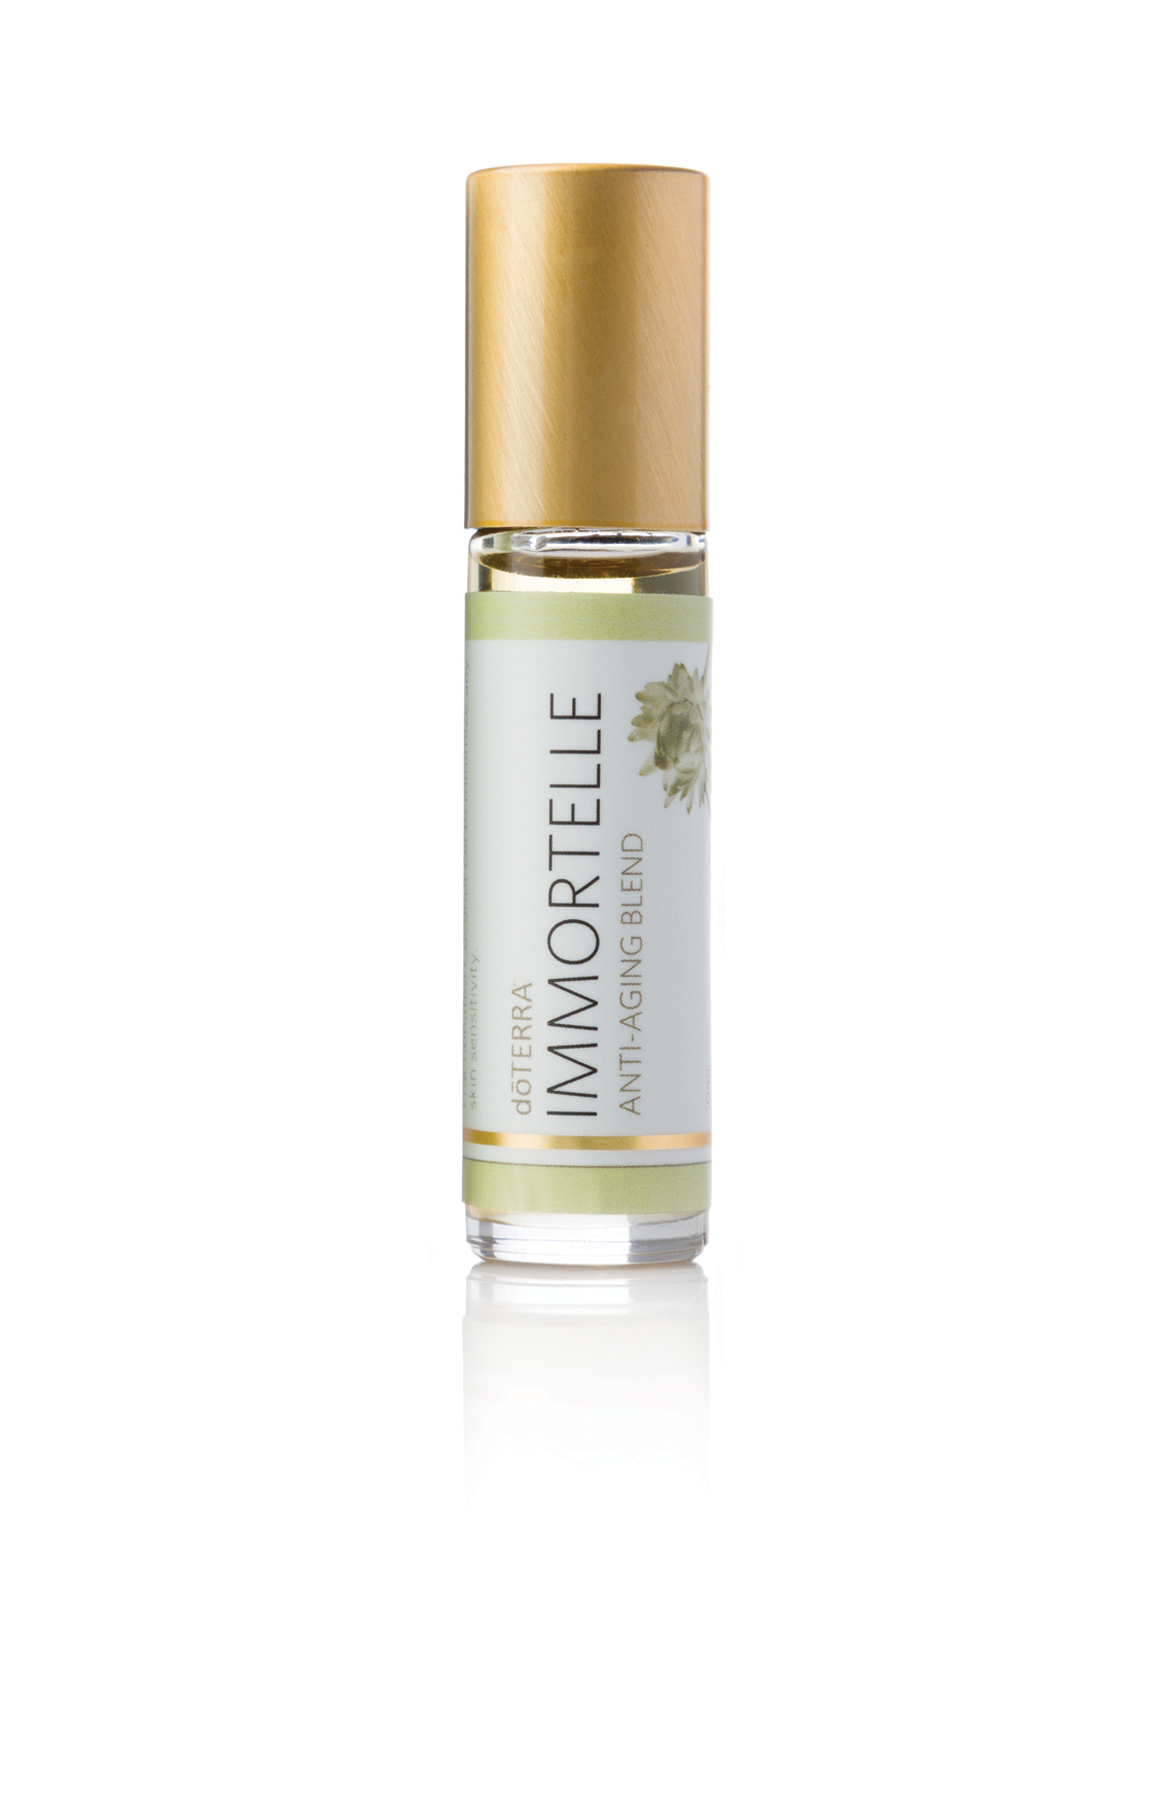 Immortelle Anti-Aging Essential Oils Blend